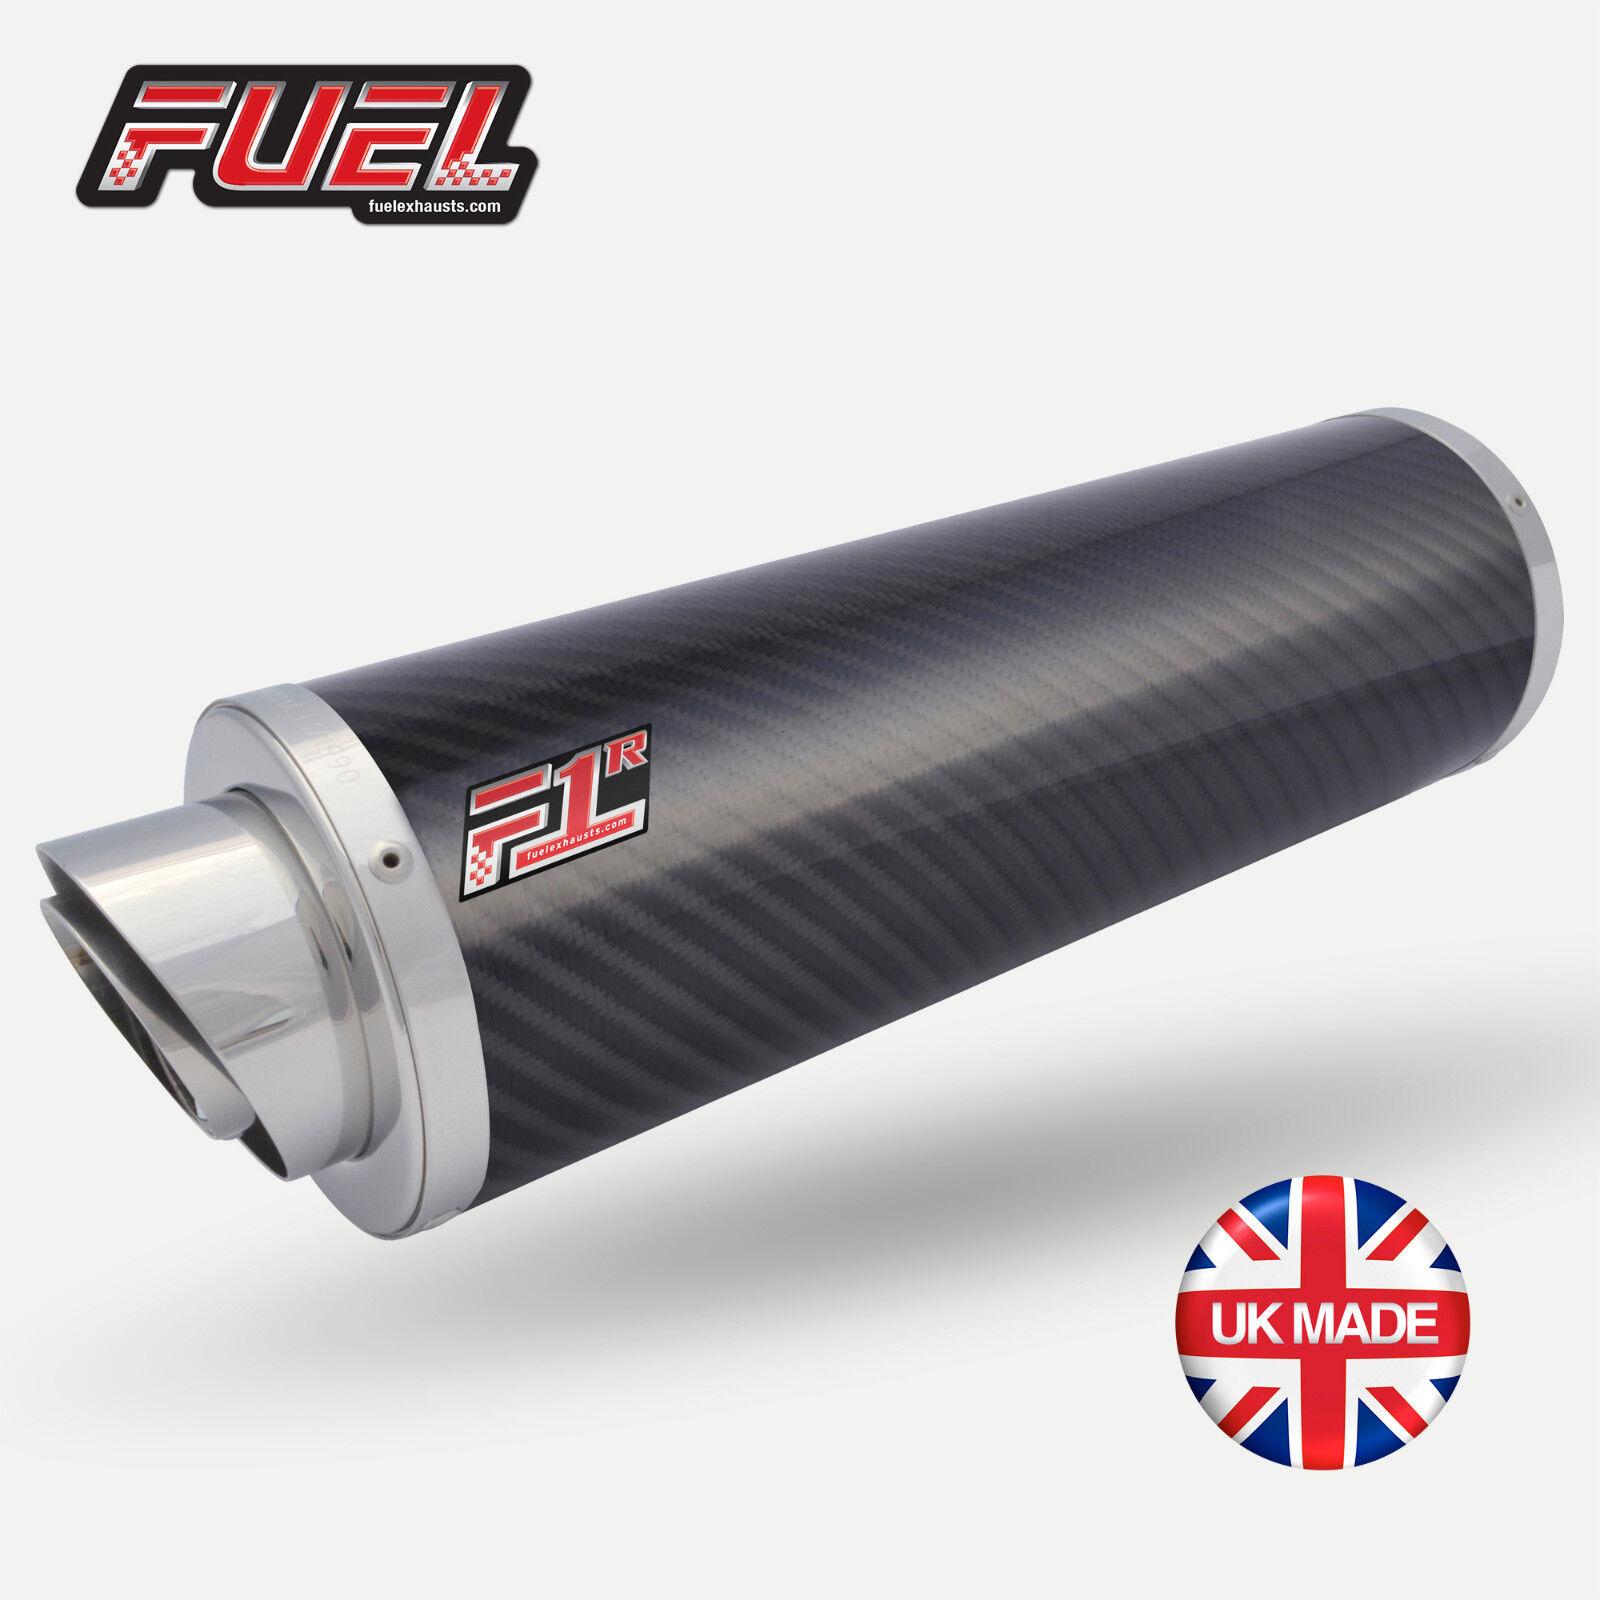 Honda Cbr500r 16+F1r 16+F1r 16+F1r Road Carbonfaser Runder Mini UK Zugelassener Auspuff 40ee87